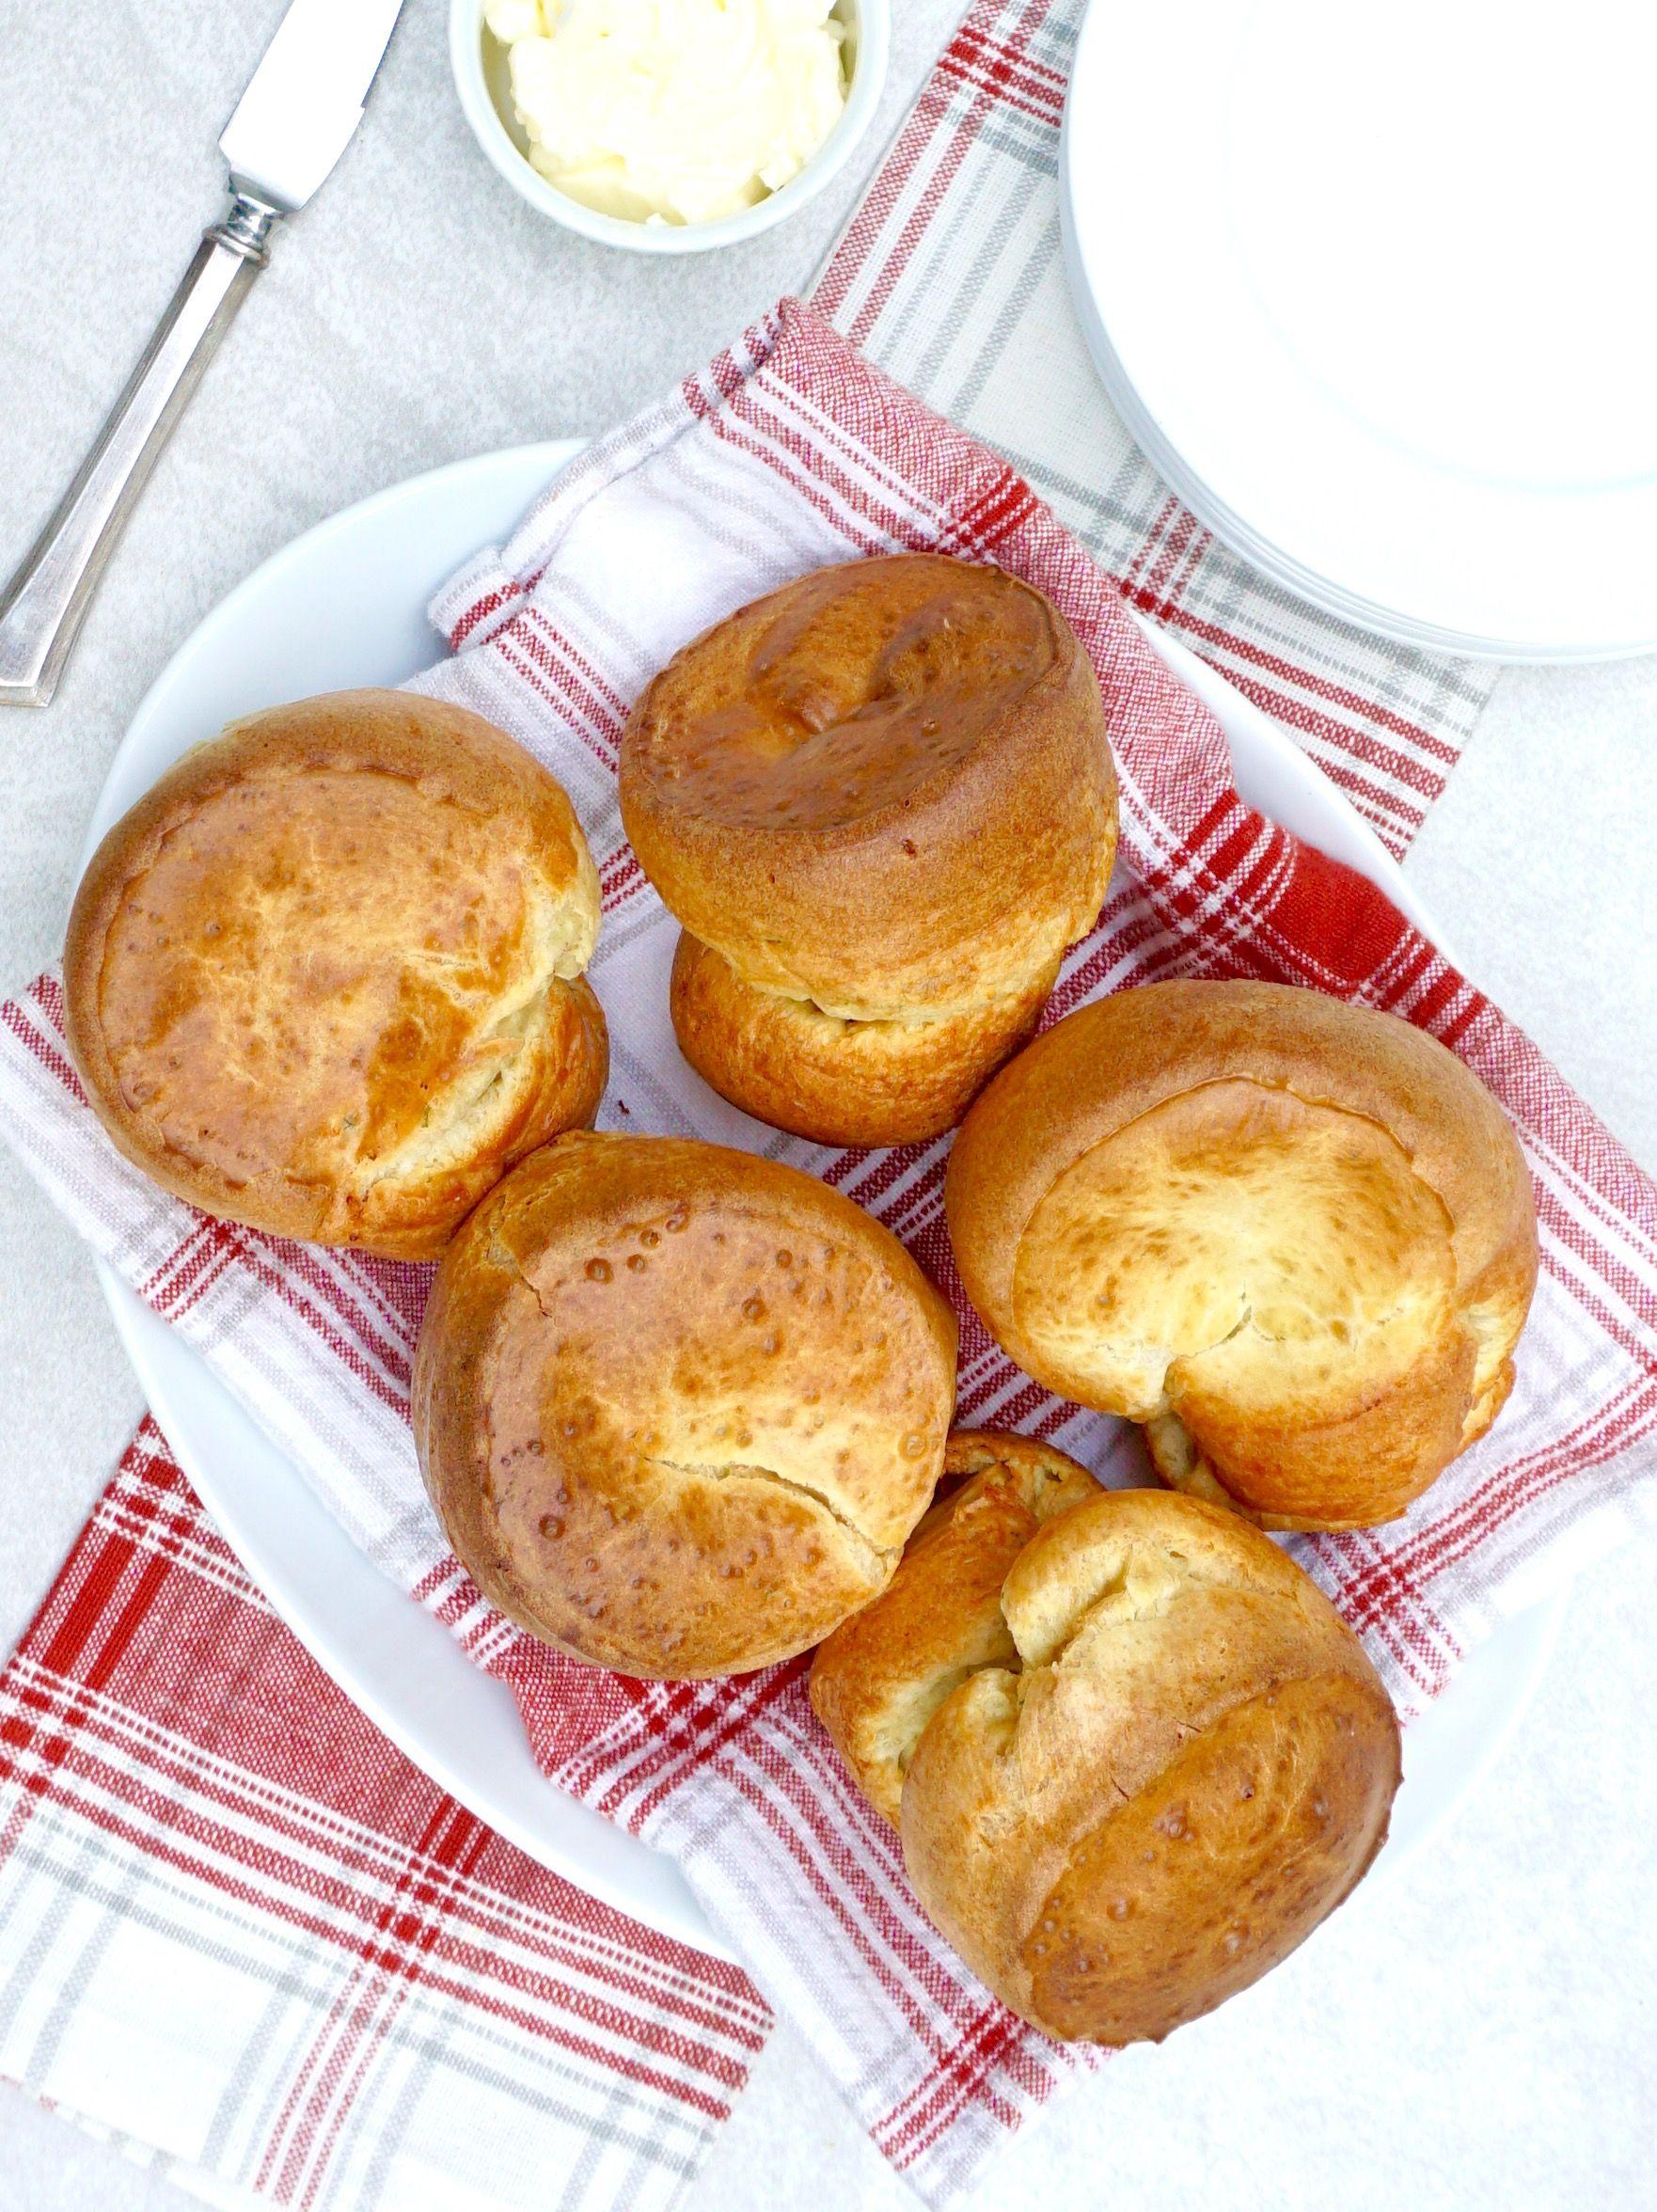 Parmesan Chive Popovers Are Fluffy Light Rolls With Chives Recipe Chive Popovers Popovers Savory Bread Recipe